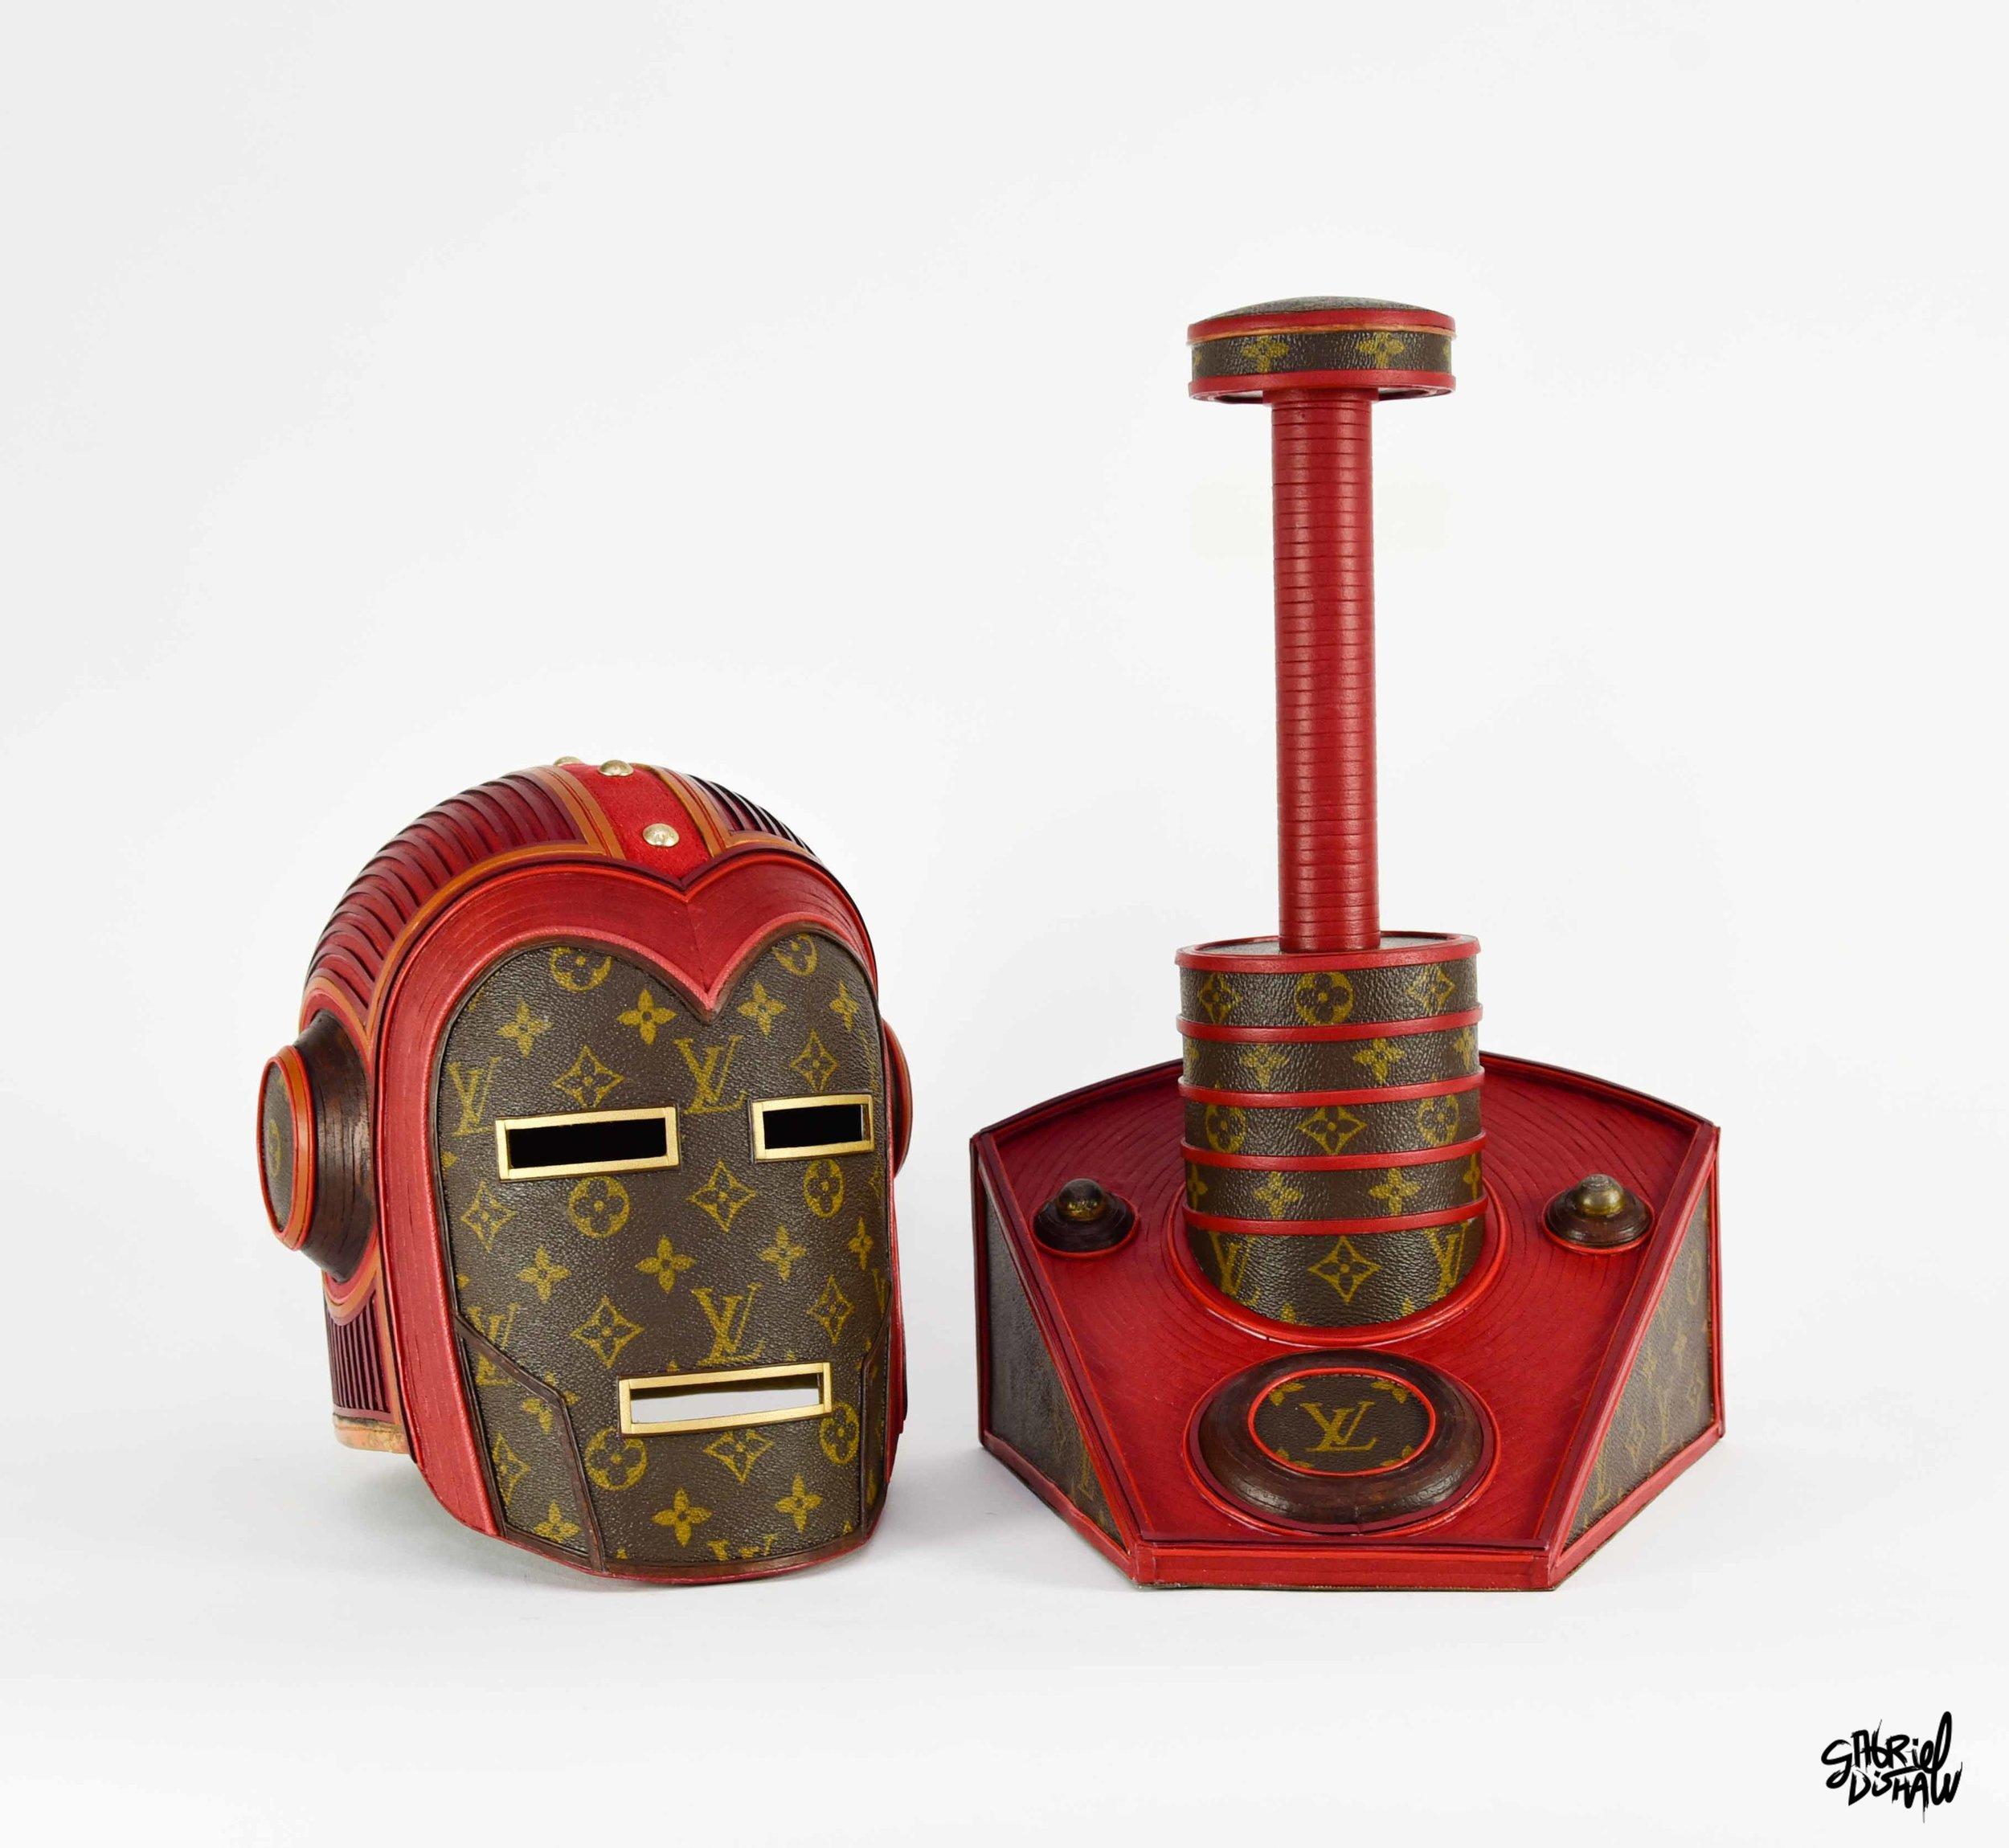 Gabriel Dishaw Vintage Iron Man LV-0228.jpg